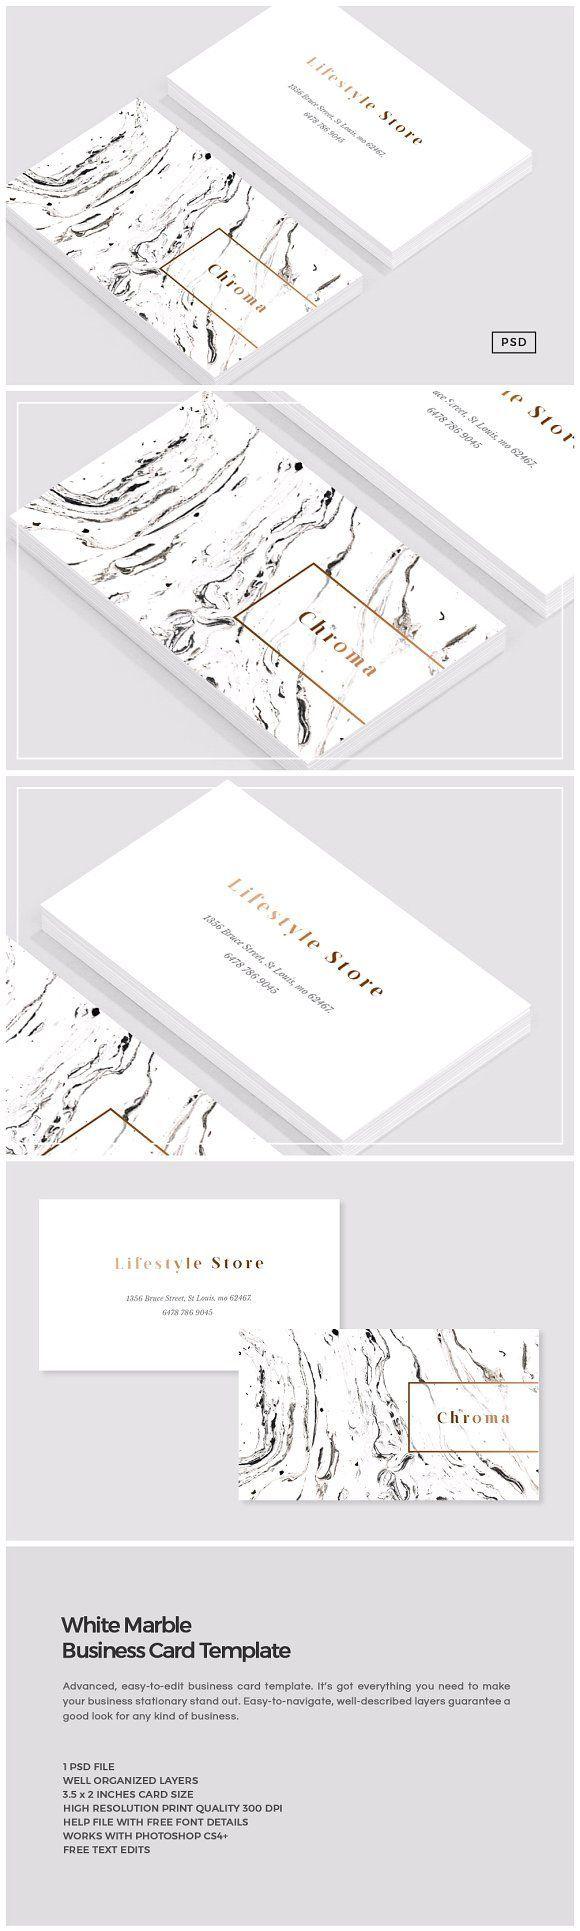 How to Design Impressive Business Cards Using Templates ~ Creative Market Blog